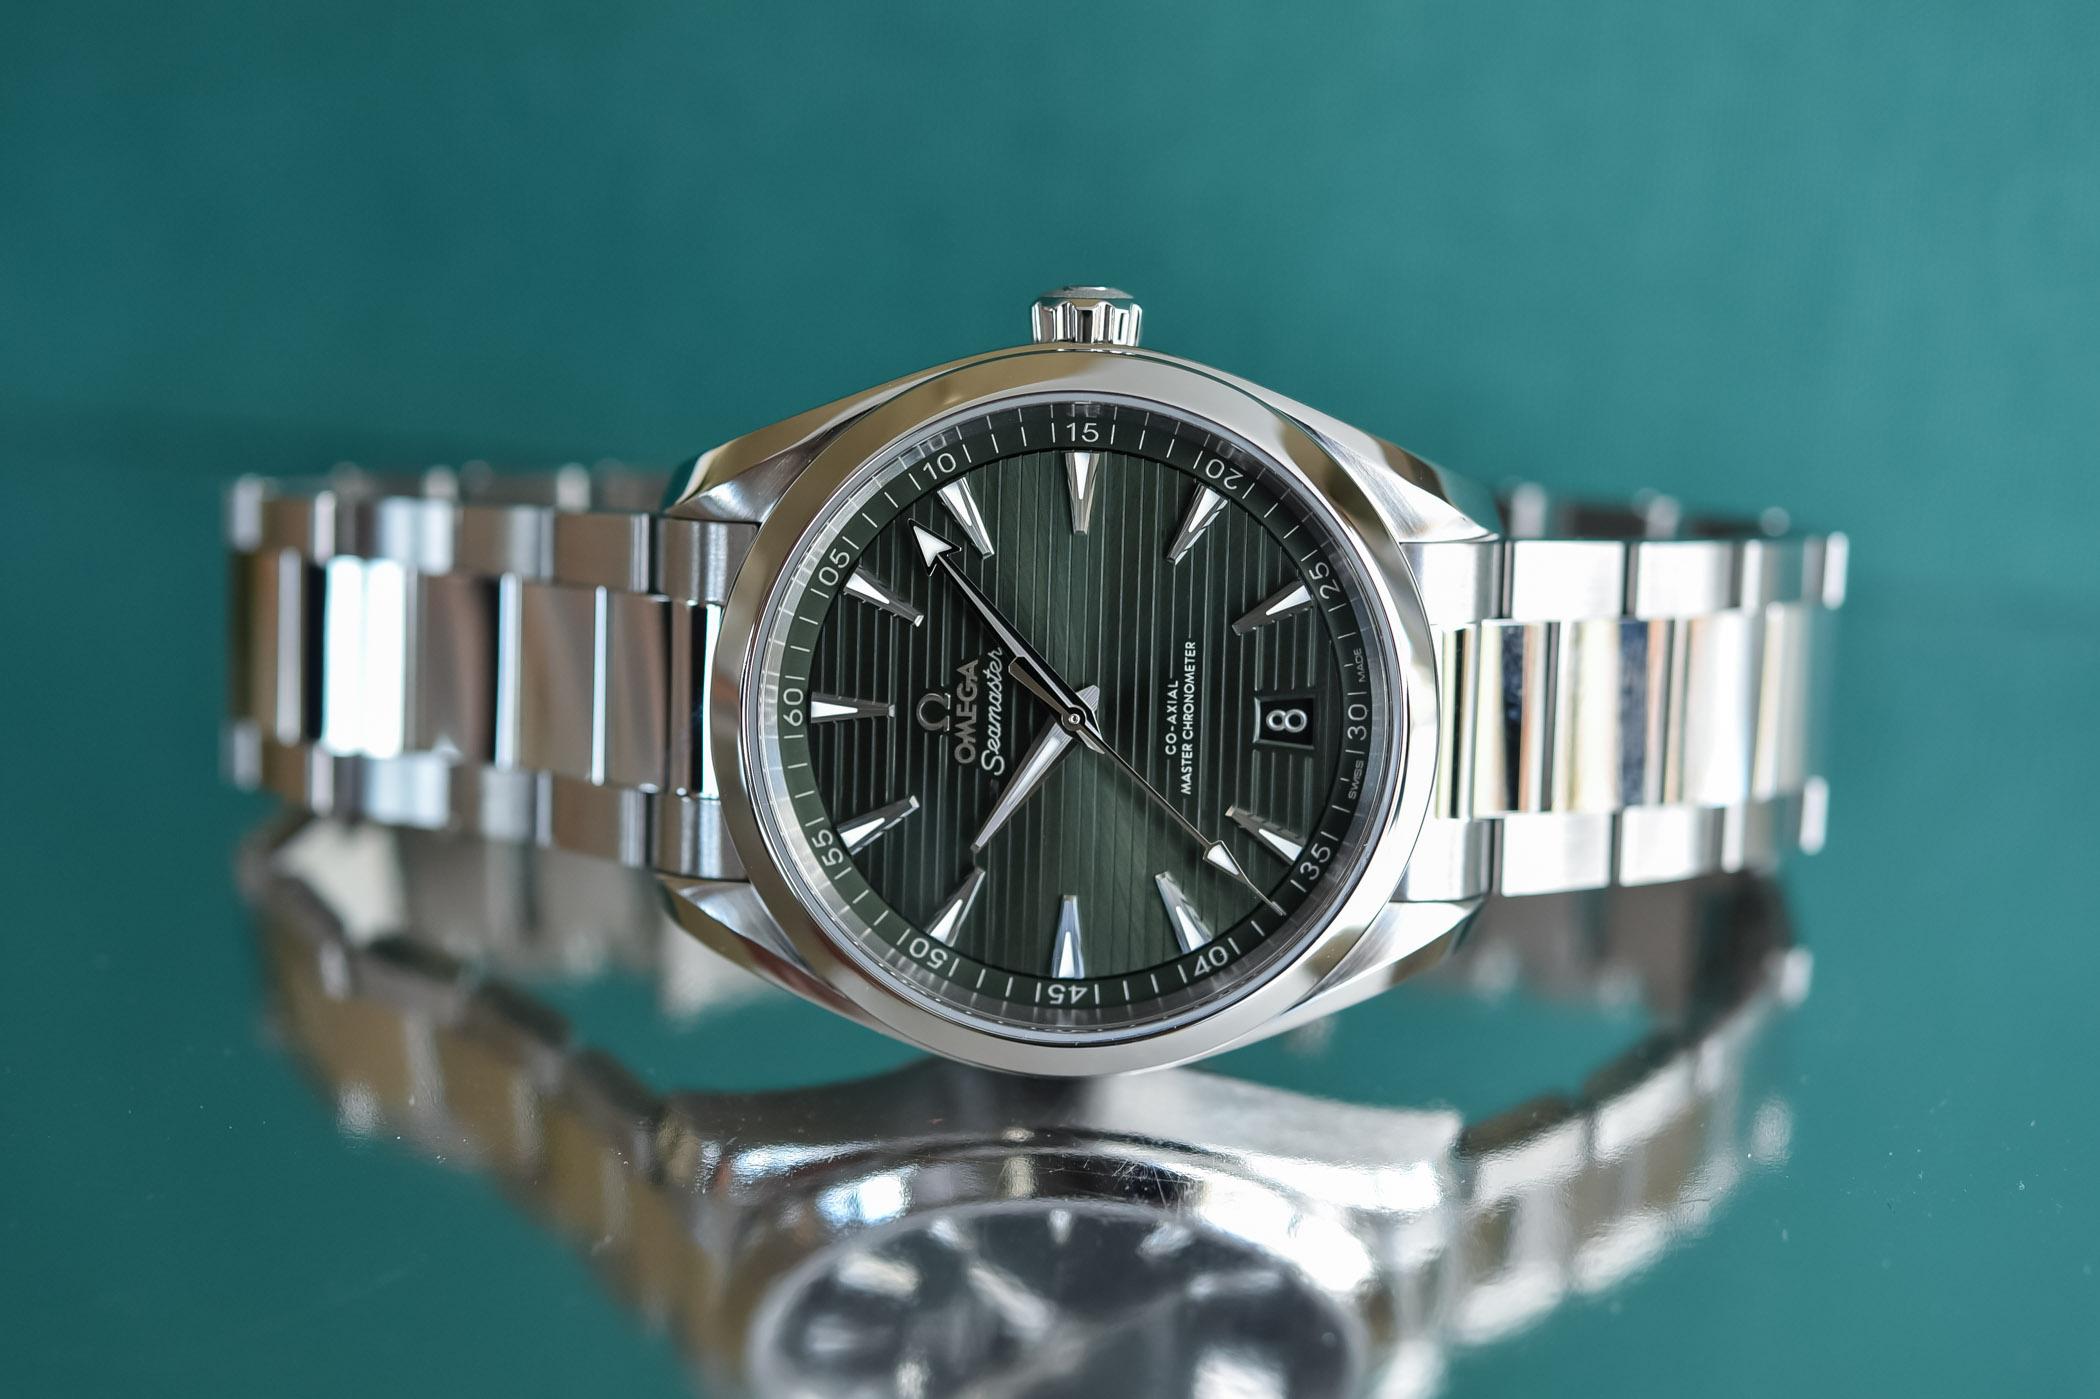 Omega Seamaster Aqua Terra 150m Master Chronometer 41mm Green Dial - 220.10.41.21.10.001